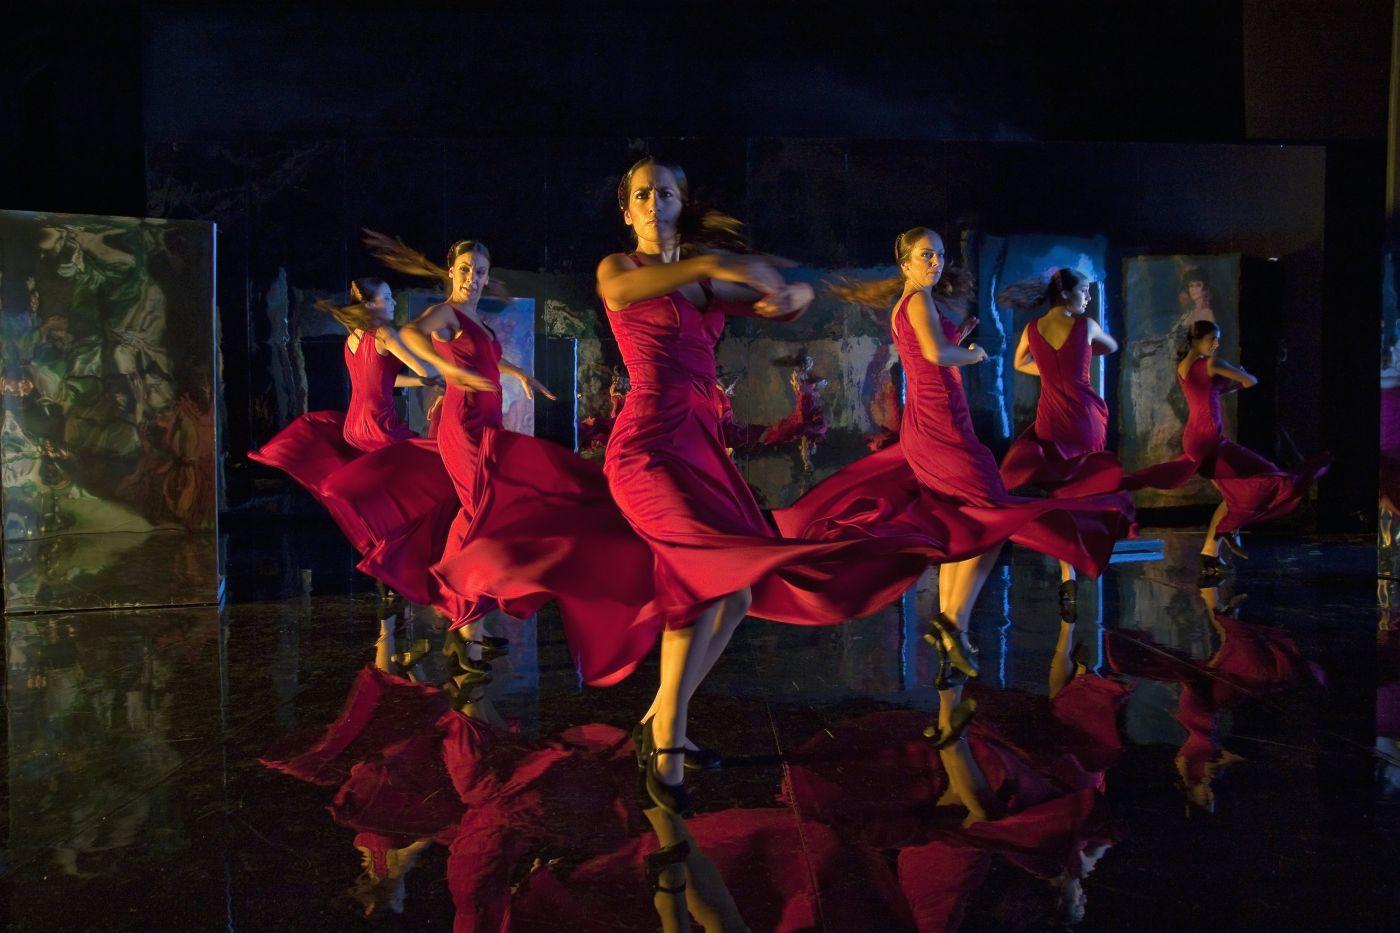 UN DOCUMENTAL MUSICAL DE CARLOS SAURA